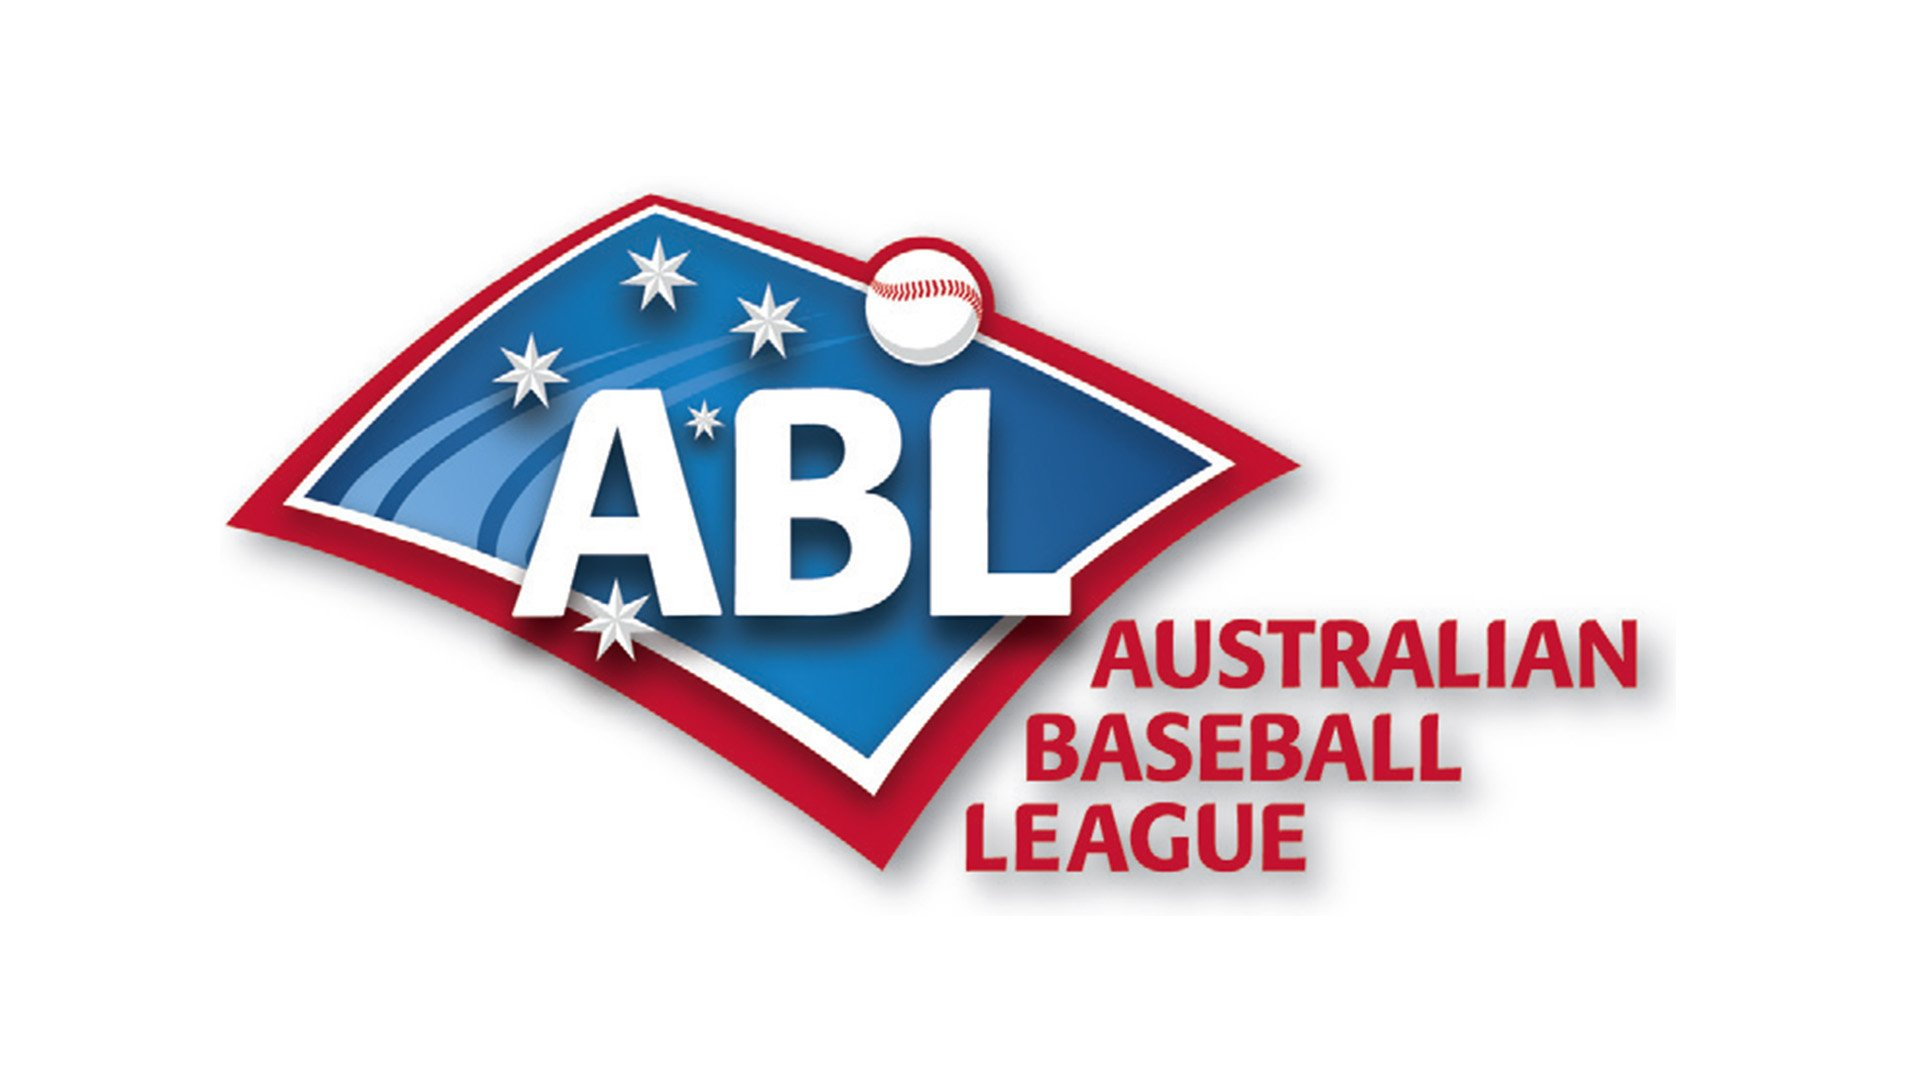 Australian Baseball League logo and symbol, meaning, history, PNG